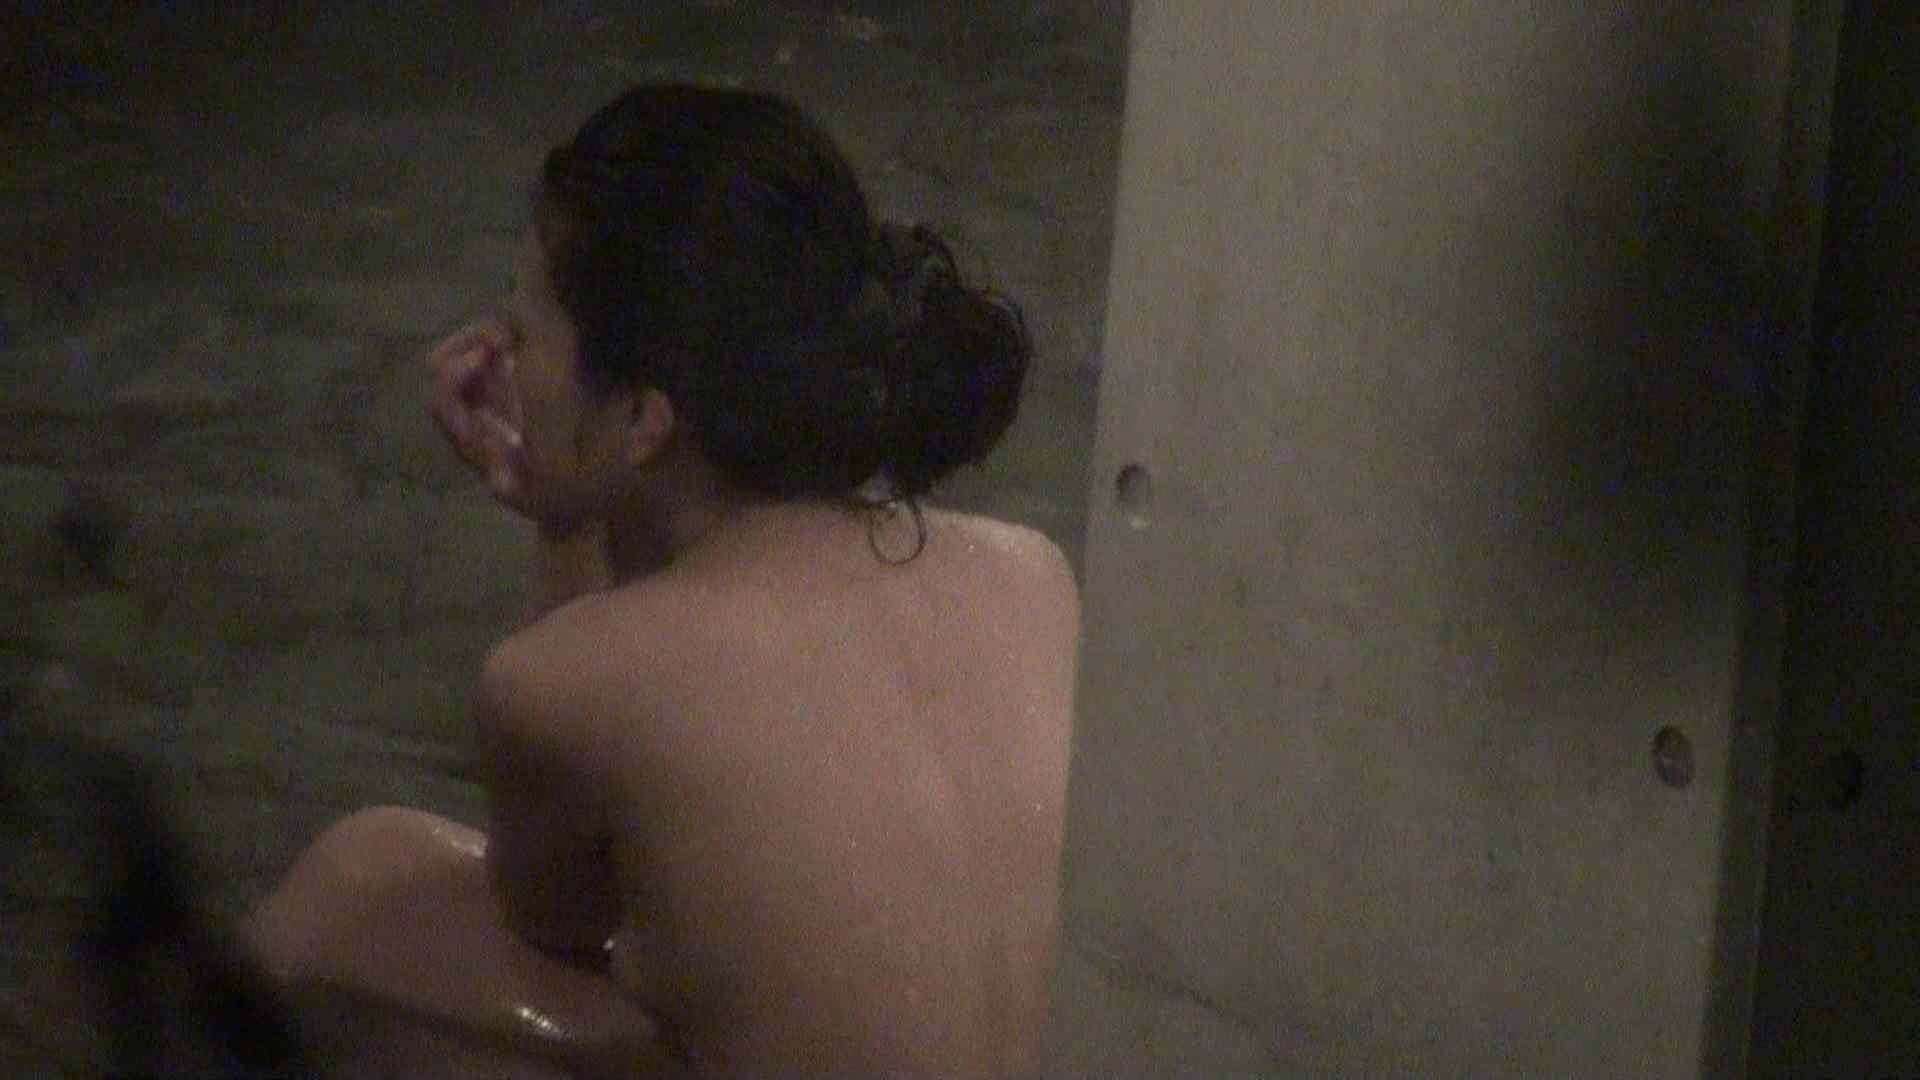 Aquaな露天風呂Vol.375 露天 盗撮セックス無修正動画無料 106連発 65